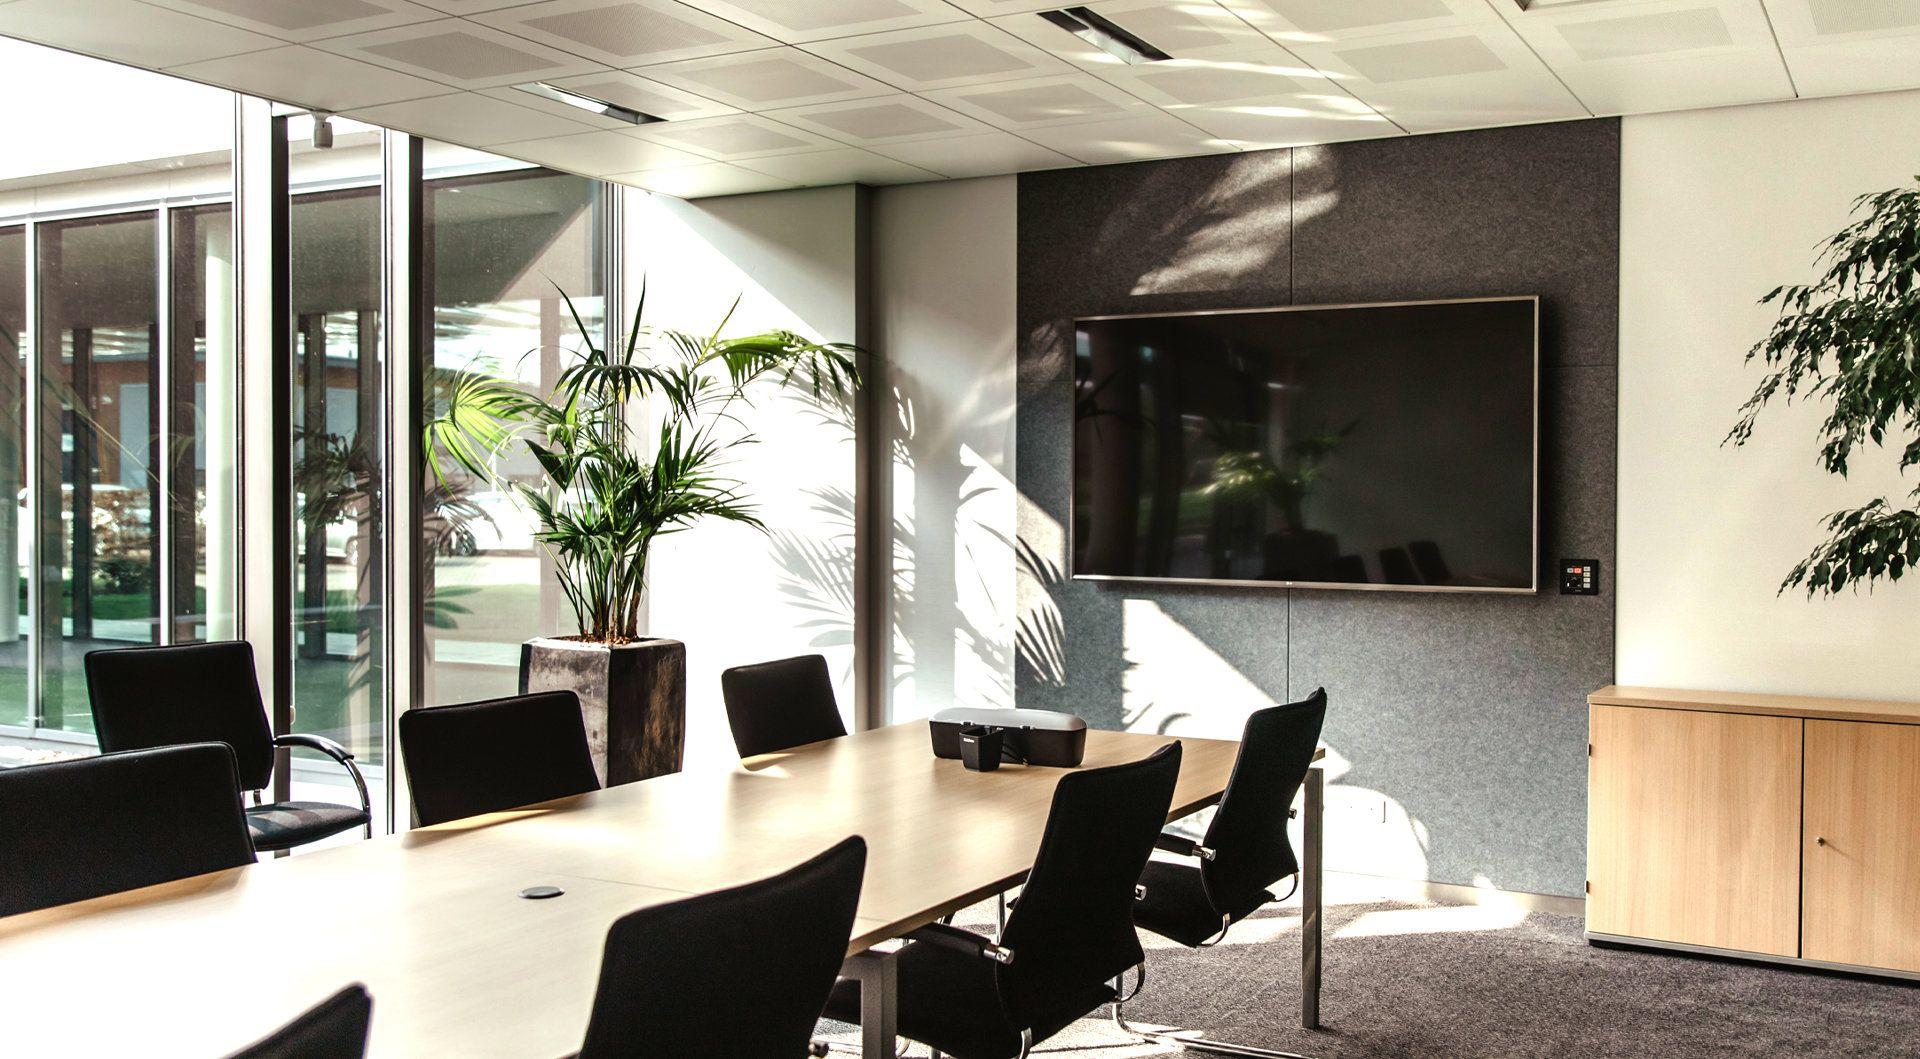 Epson EB-G7900U beamer/projector - Case studie de vries